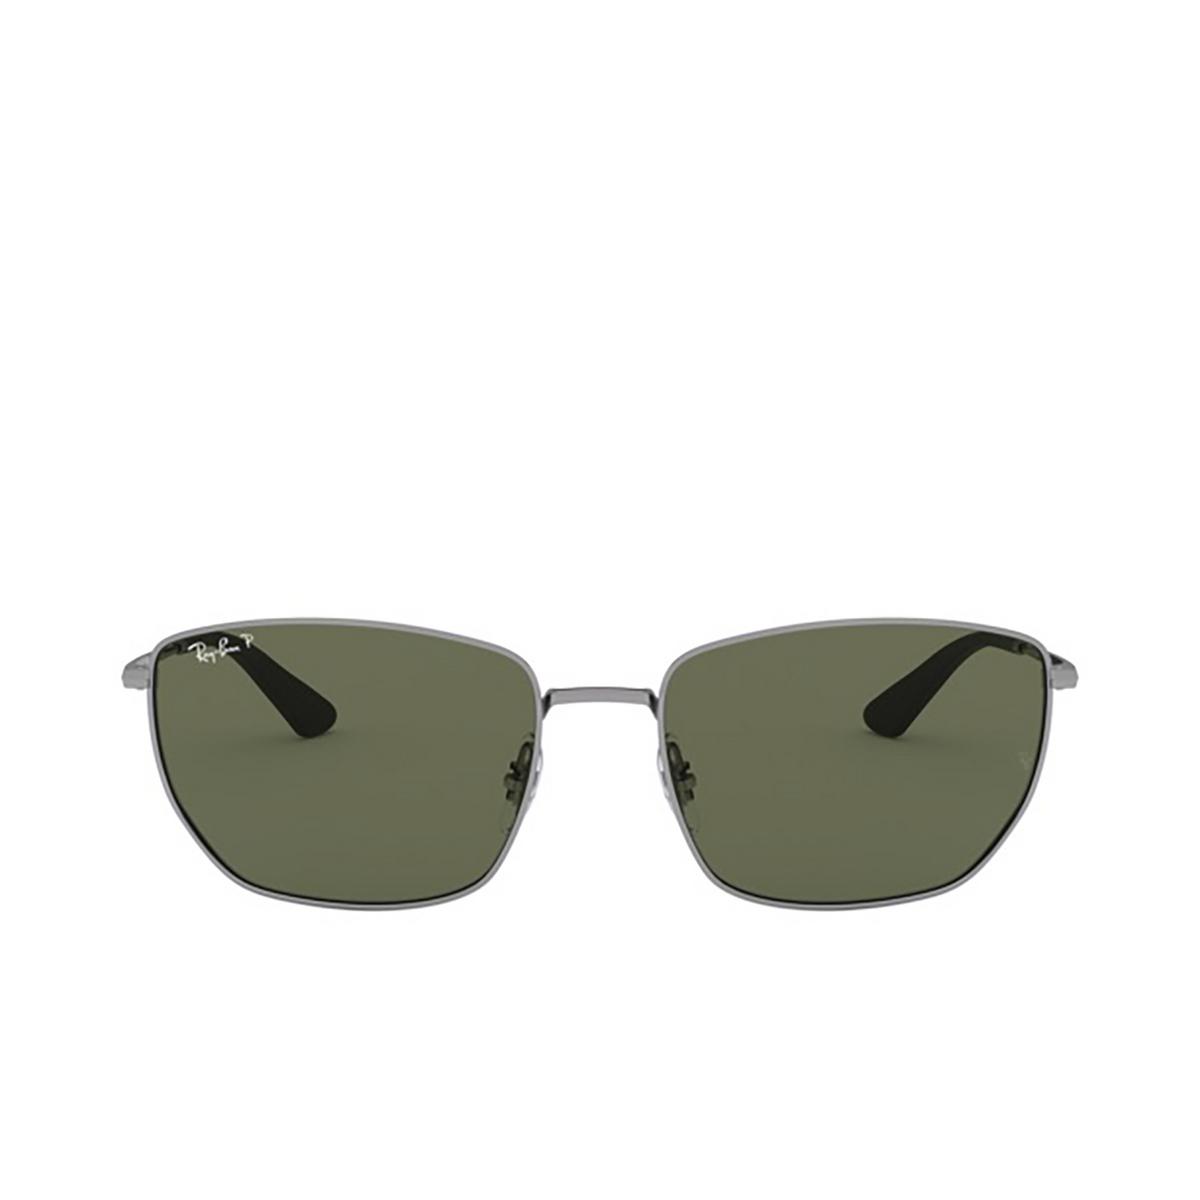 Ray-Ban® Square Sunglasses: RB3653 color Gunmetal 004/9A - 1/3.